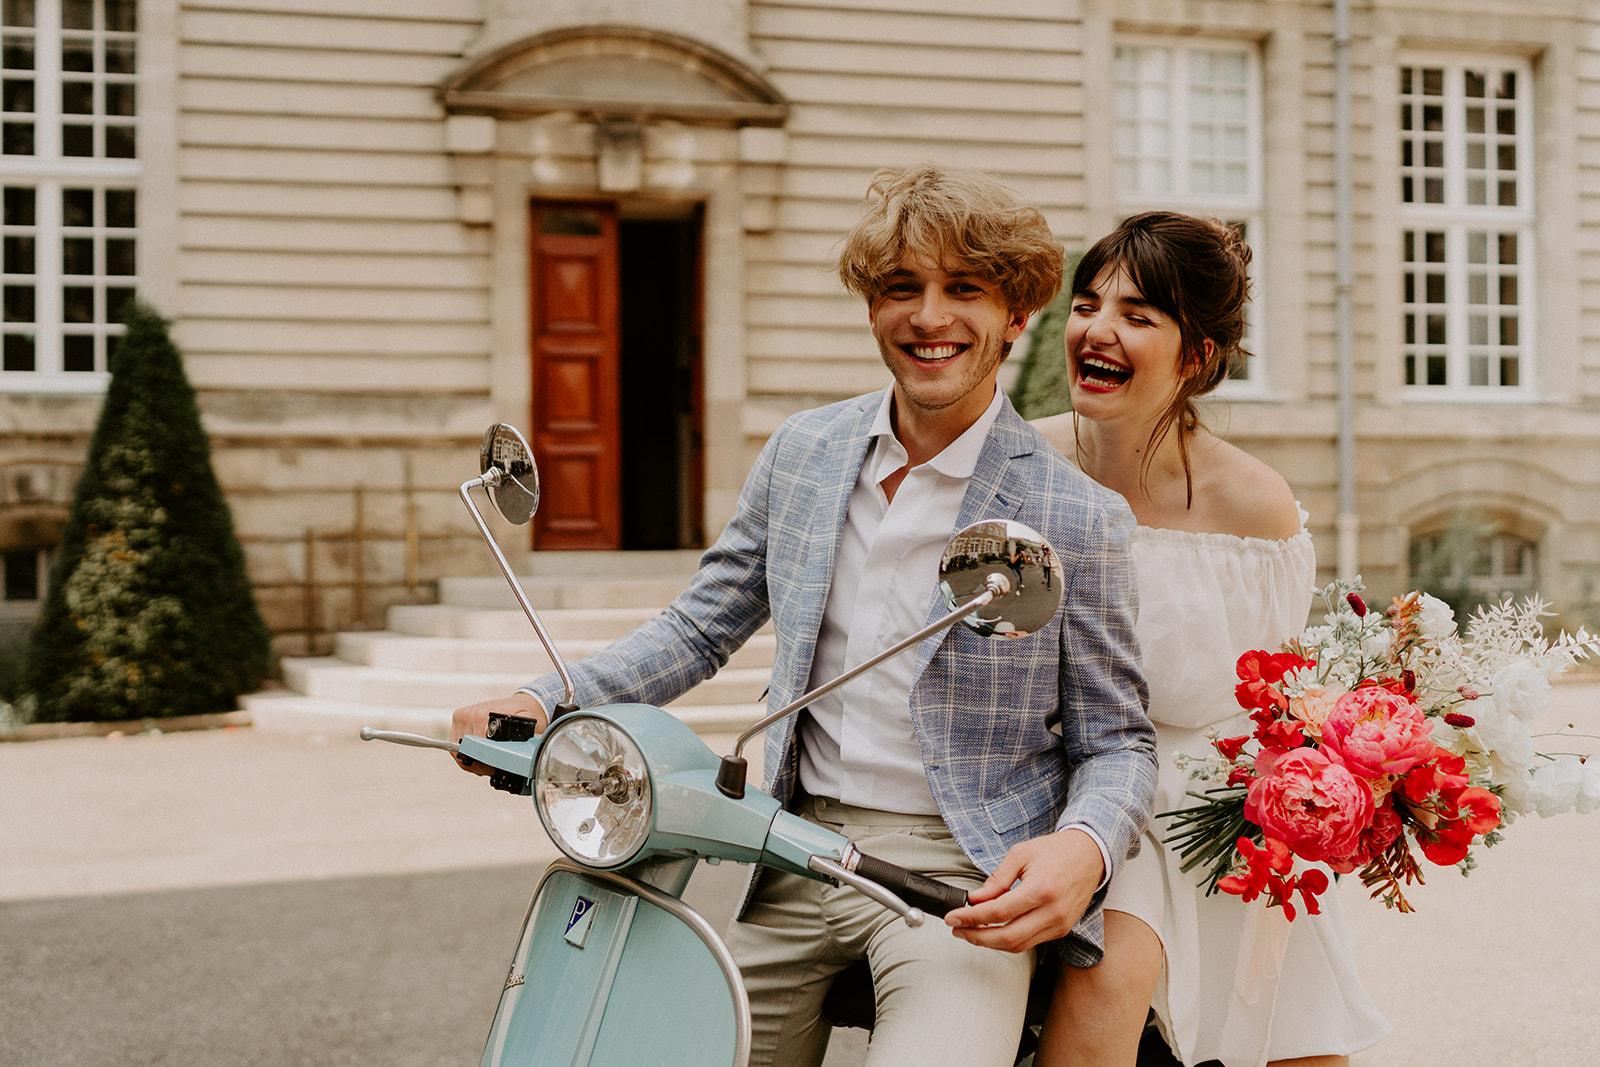 mariage dolce vita maries vespa robe costume bouquet